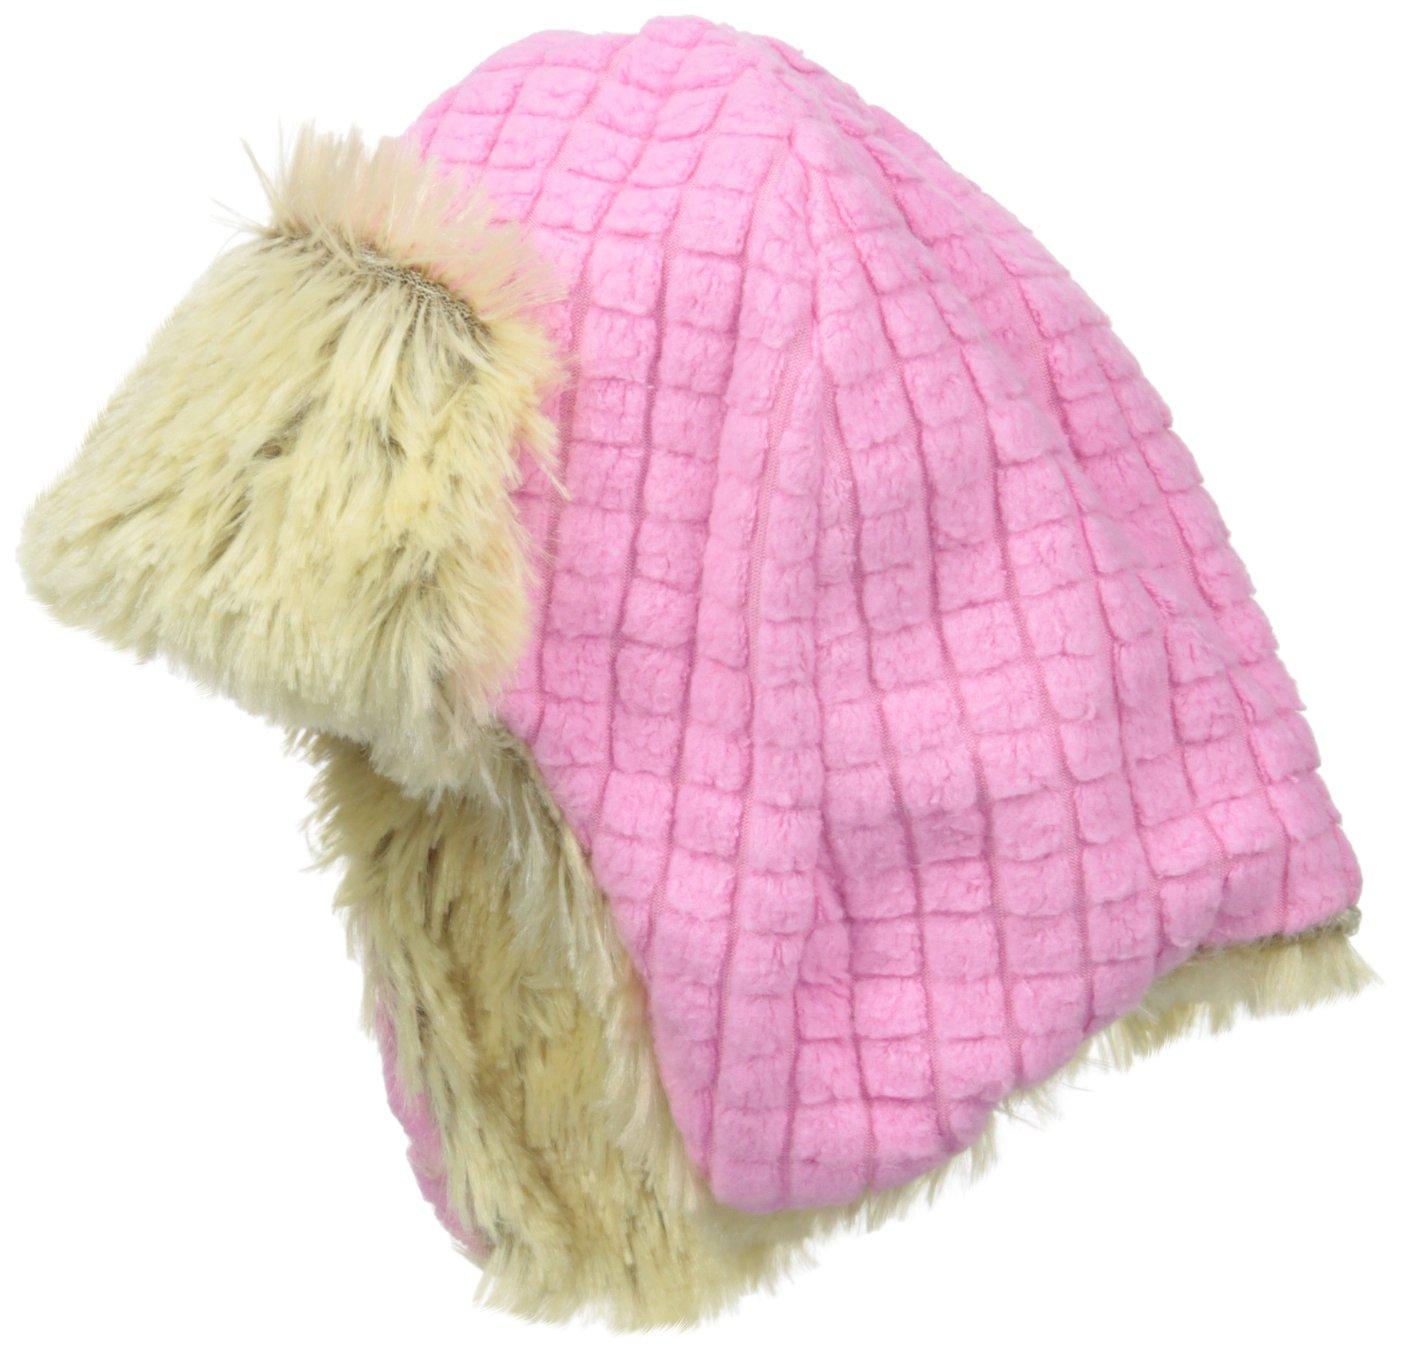 Zutano Unisex-Baby Infant Waffle Cozie Fleece Shaggy Cap  Amazon.ca   Clothing   Accessories 724bc3d4ae6b